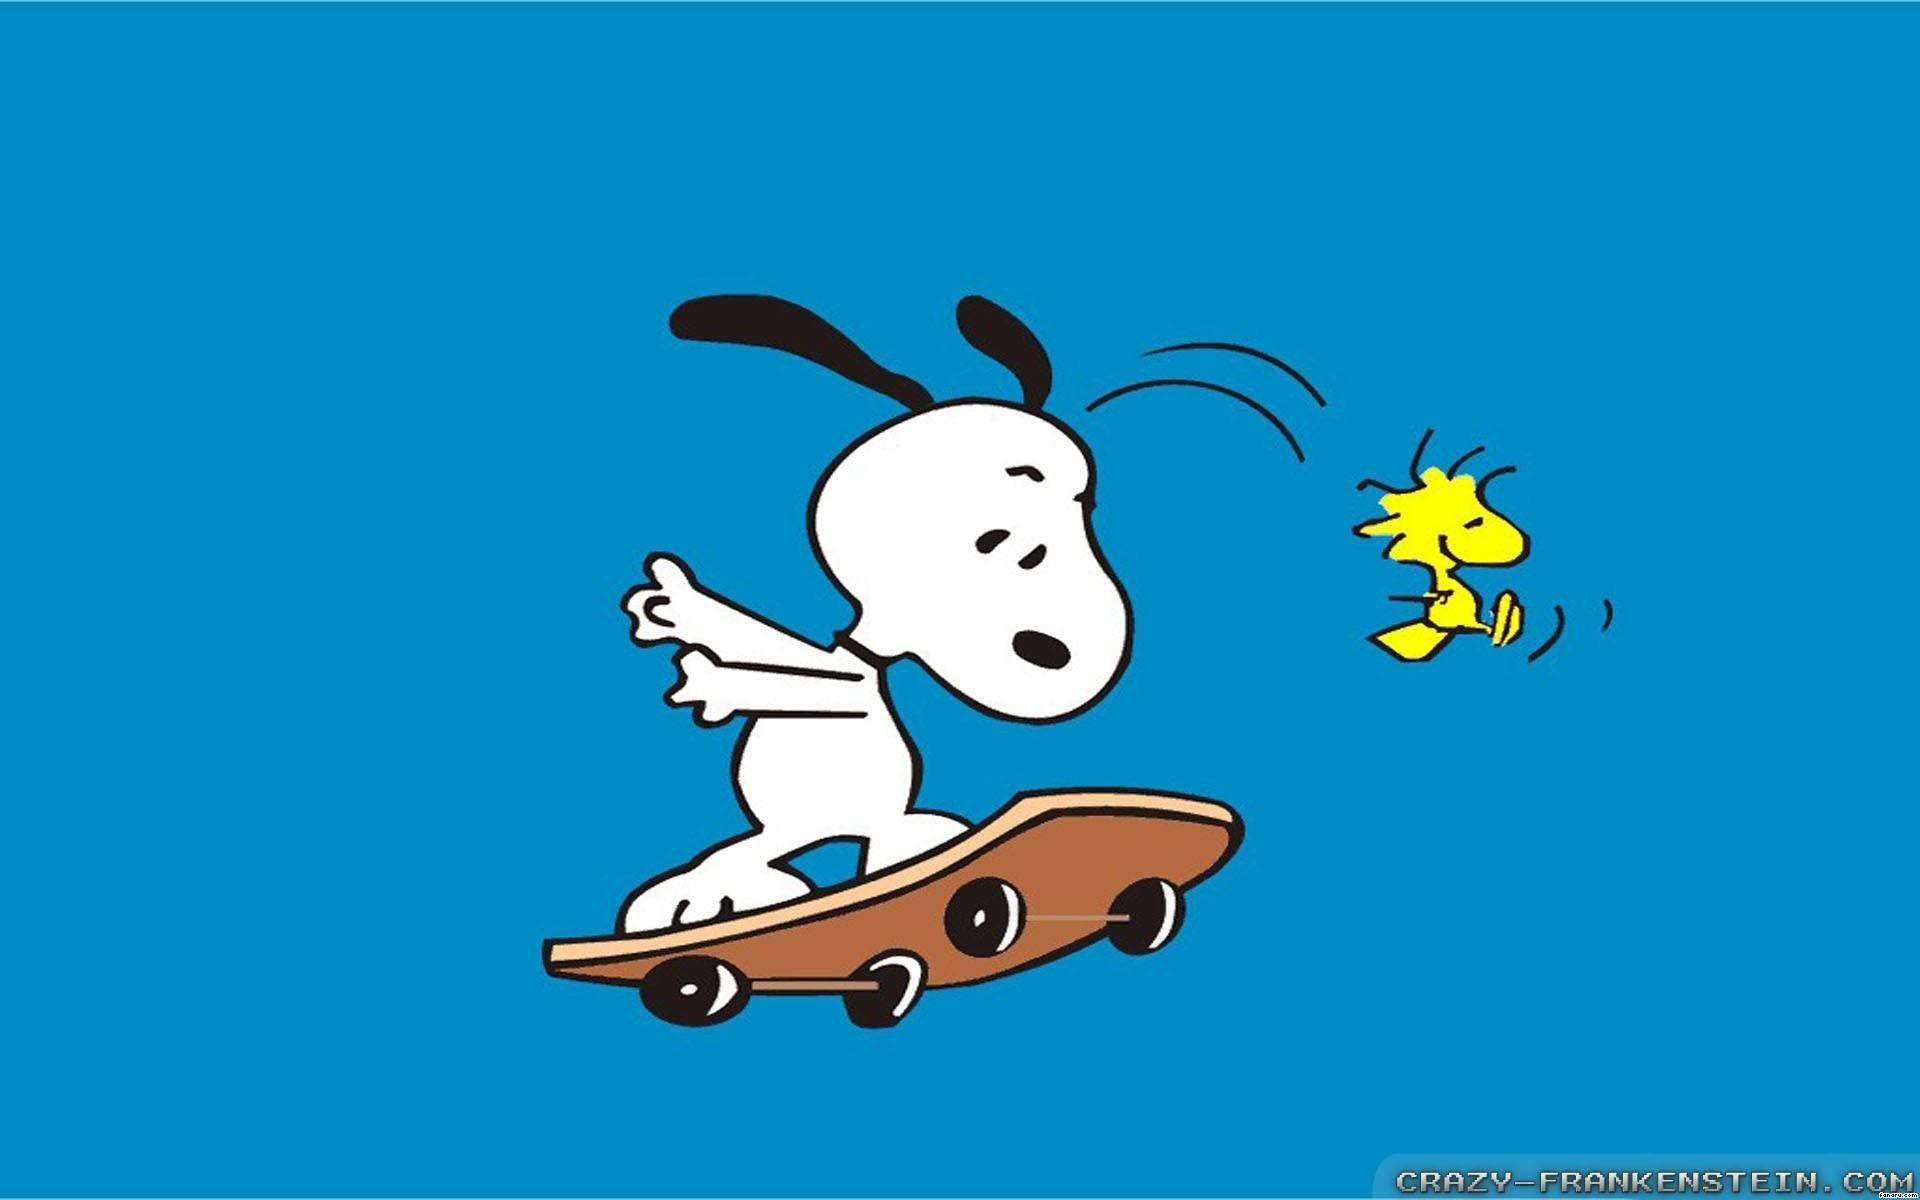 25 Snoopy Fondos De Pantalla HD